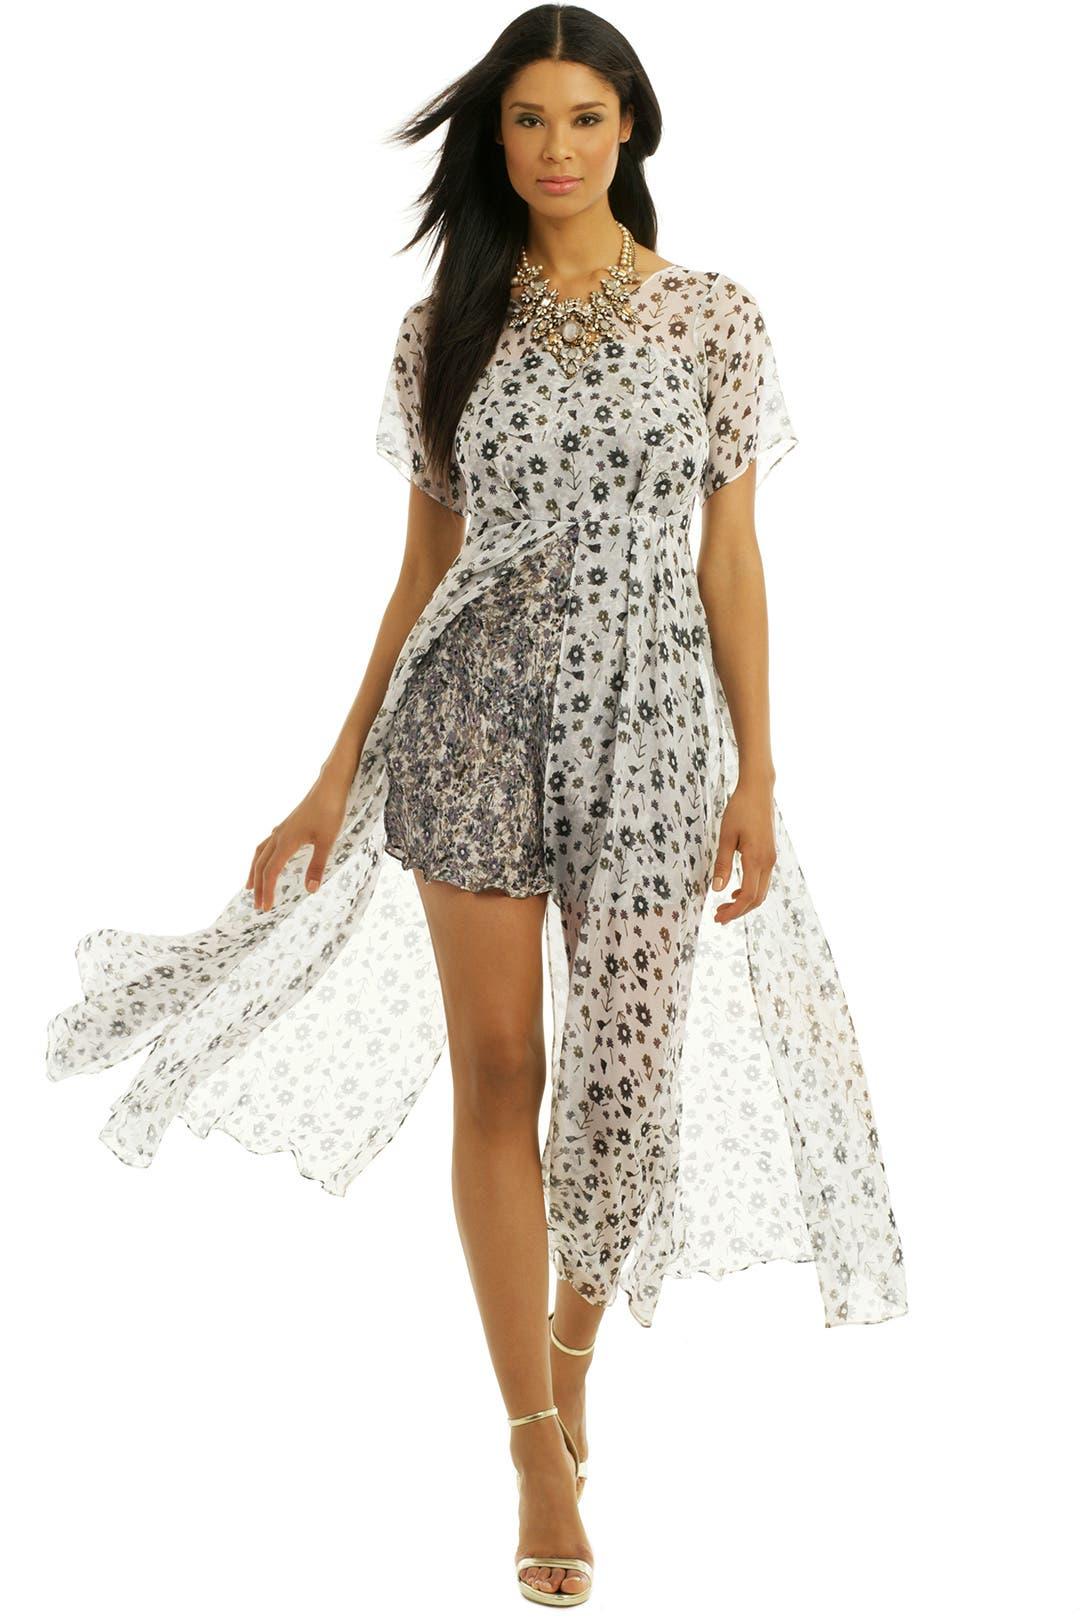 Dystal Itopaz Dress by theory